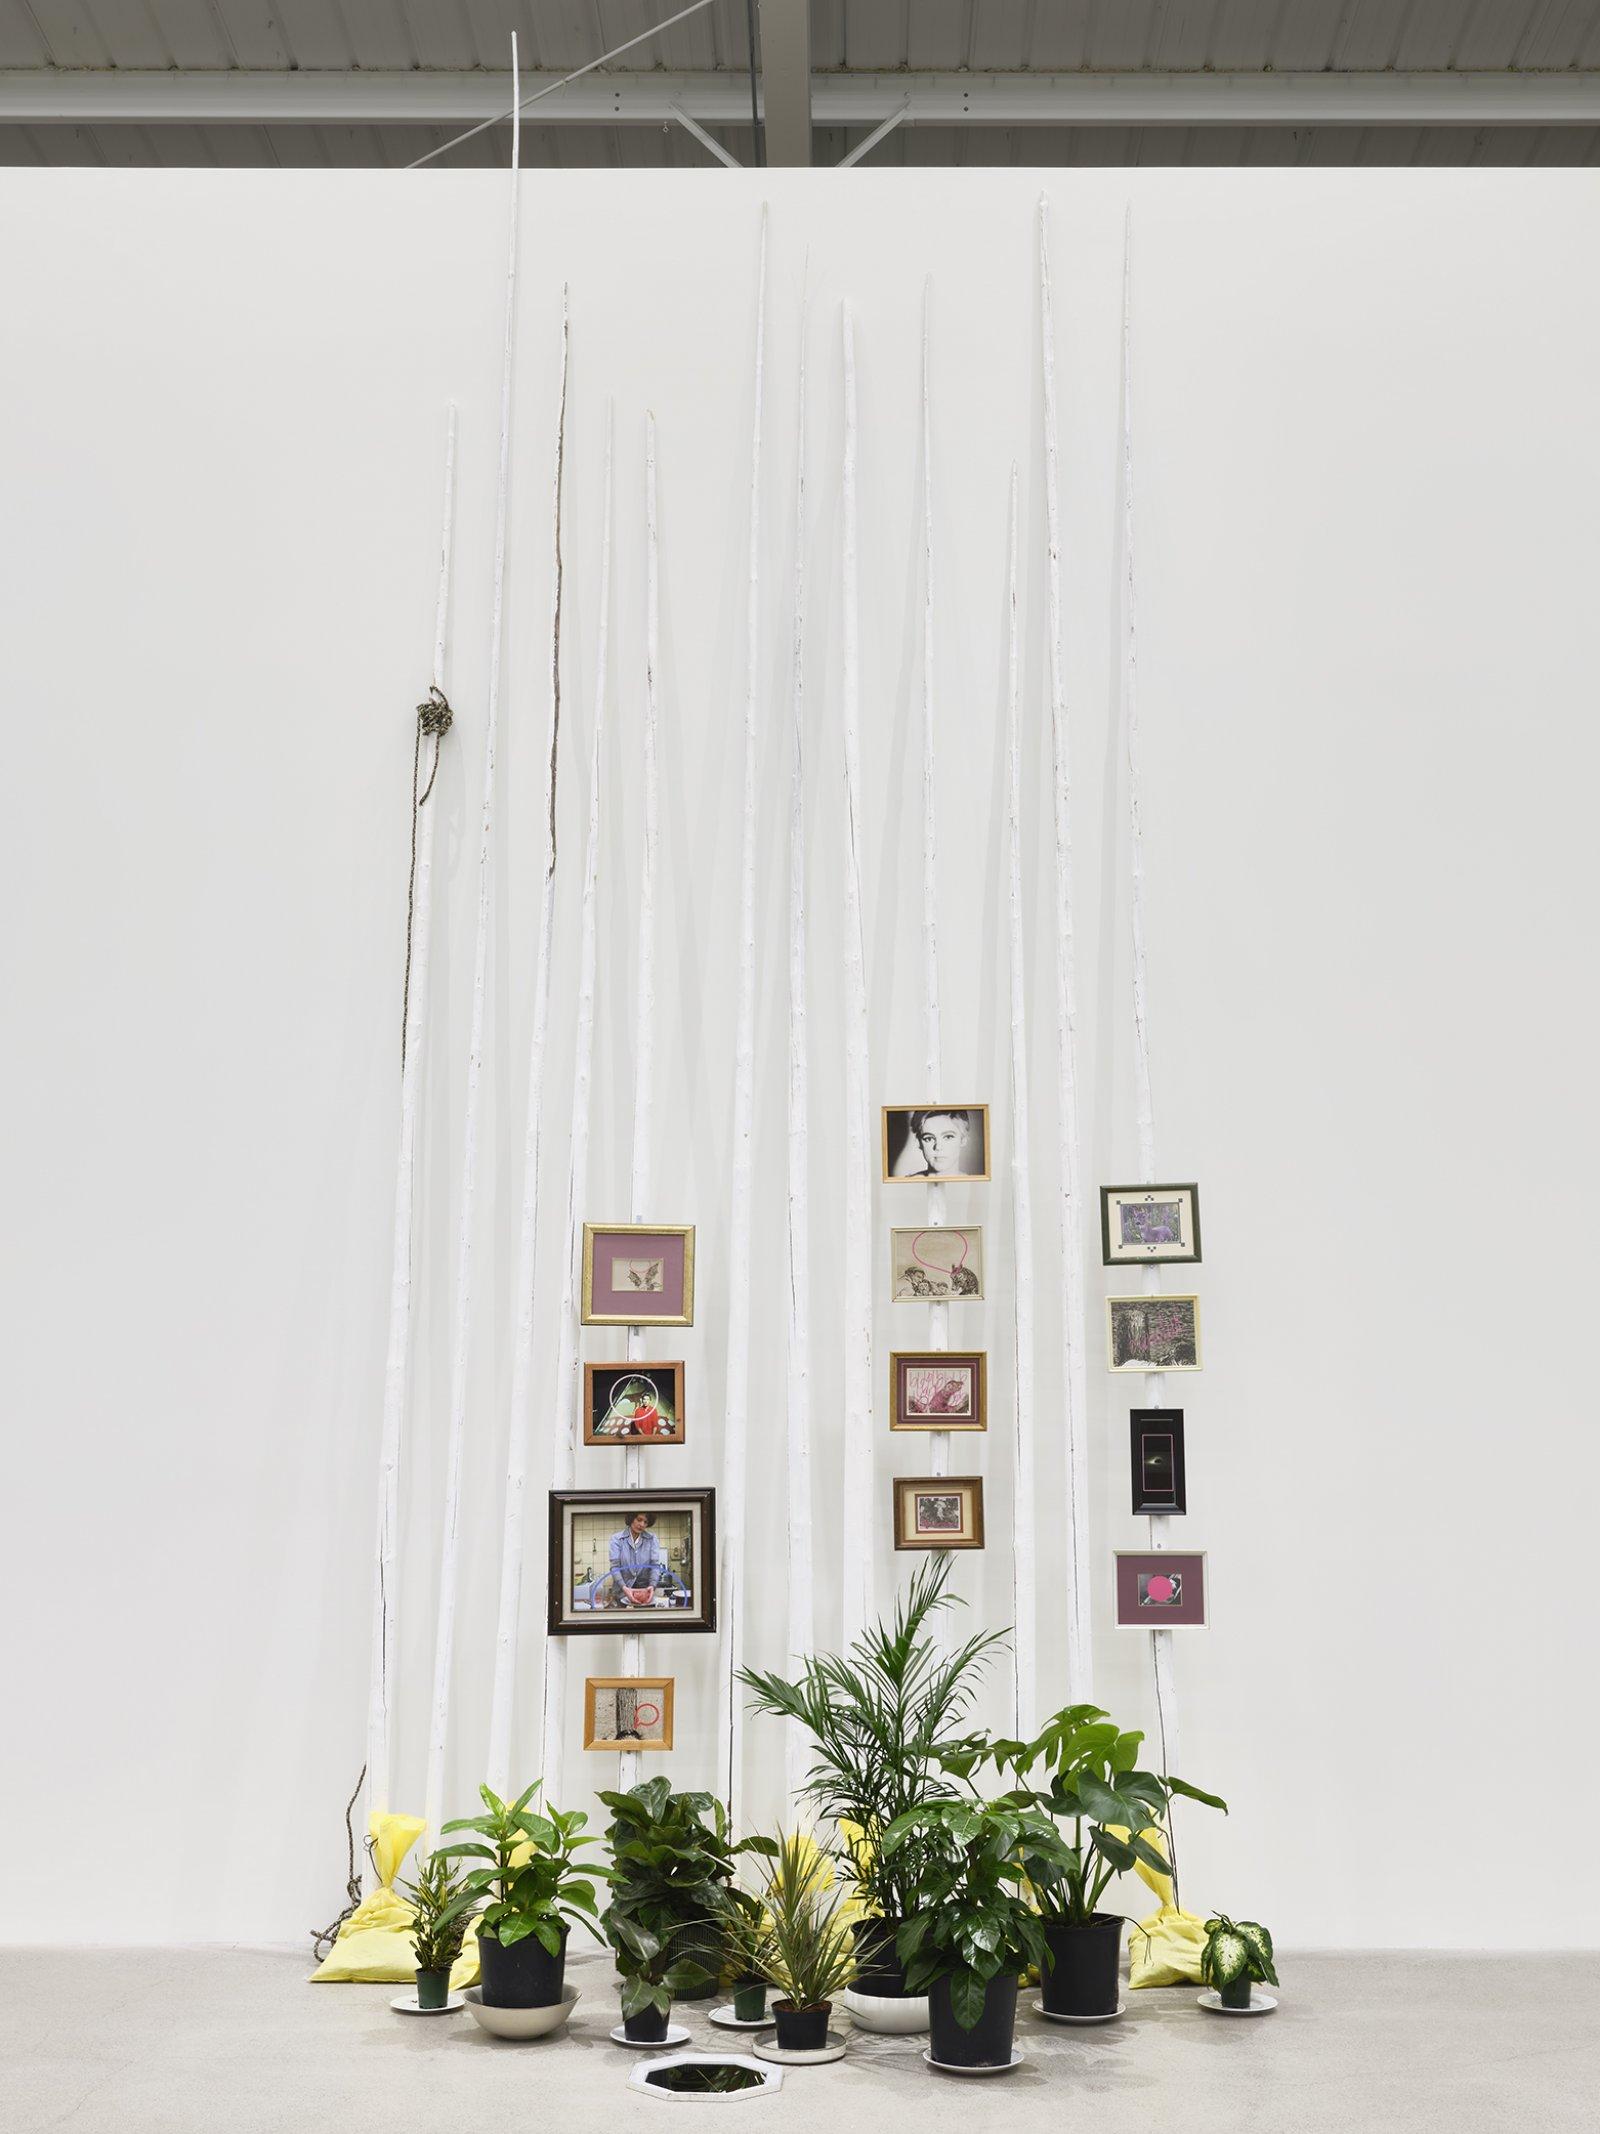 Duane Linklater, action at a distance, 2020, teepee poles, paint, nylon rope, plants, plates, ceramics, sandbags, frames, 12 digital prints, mirror, 233 x 102 x 66 in. (592 x 259 x 168 cm)